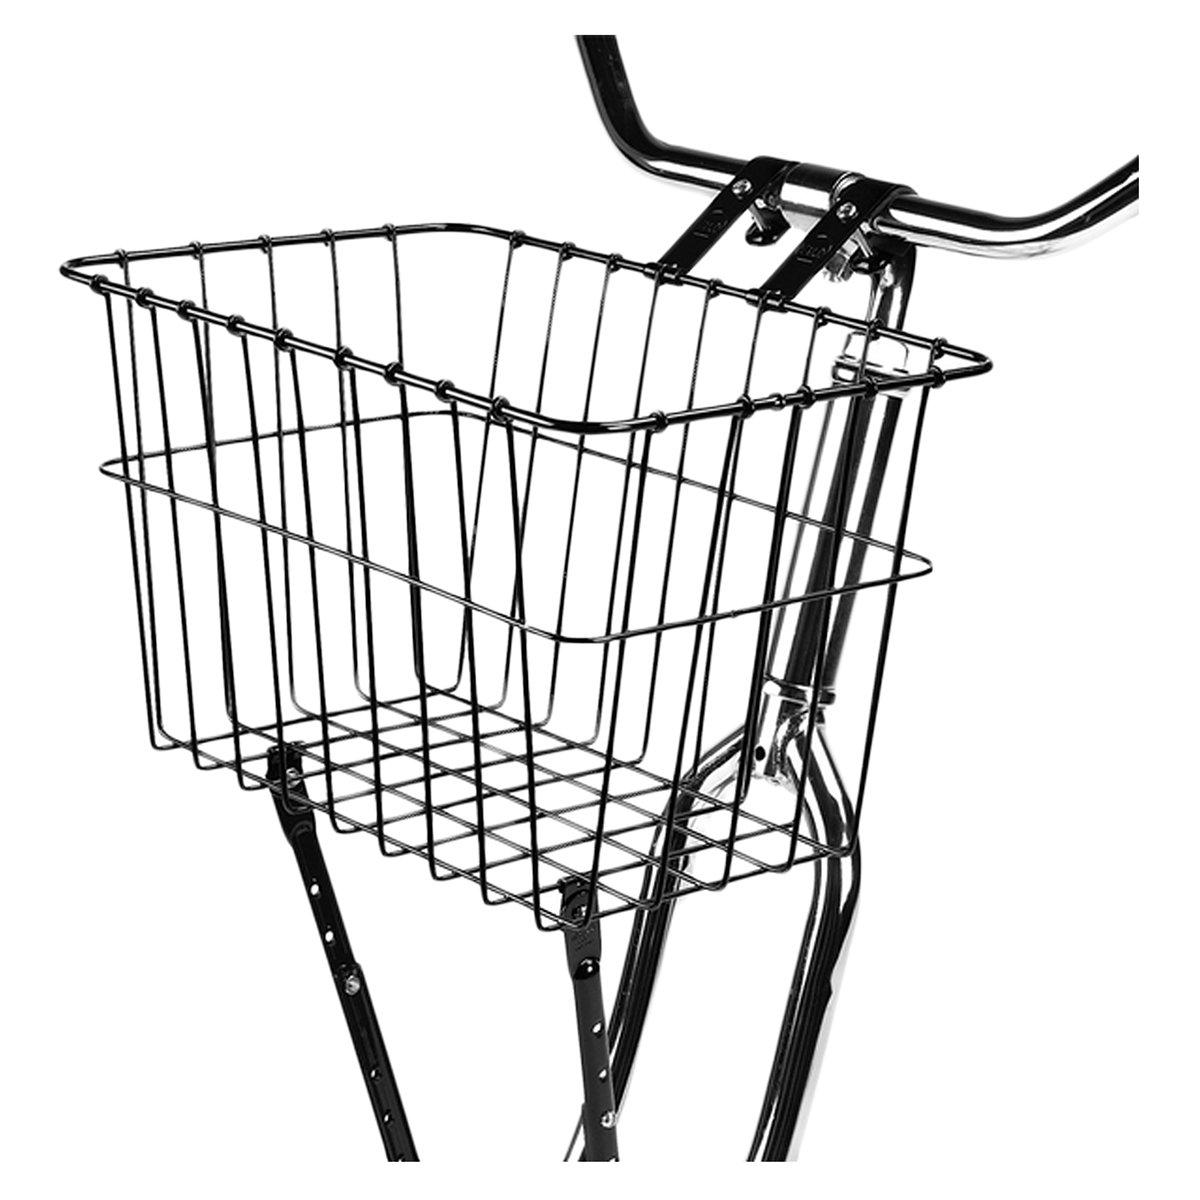 Wald # 198 multi-fitフロントHandlebar Bikeバスケット – ホワイト  シルバー B00JI6AV7O